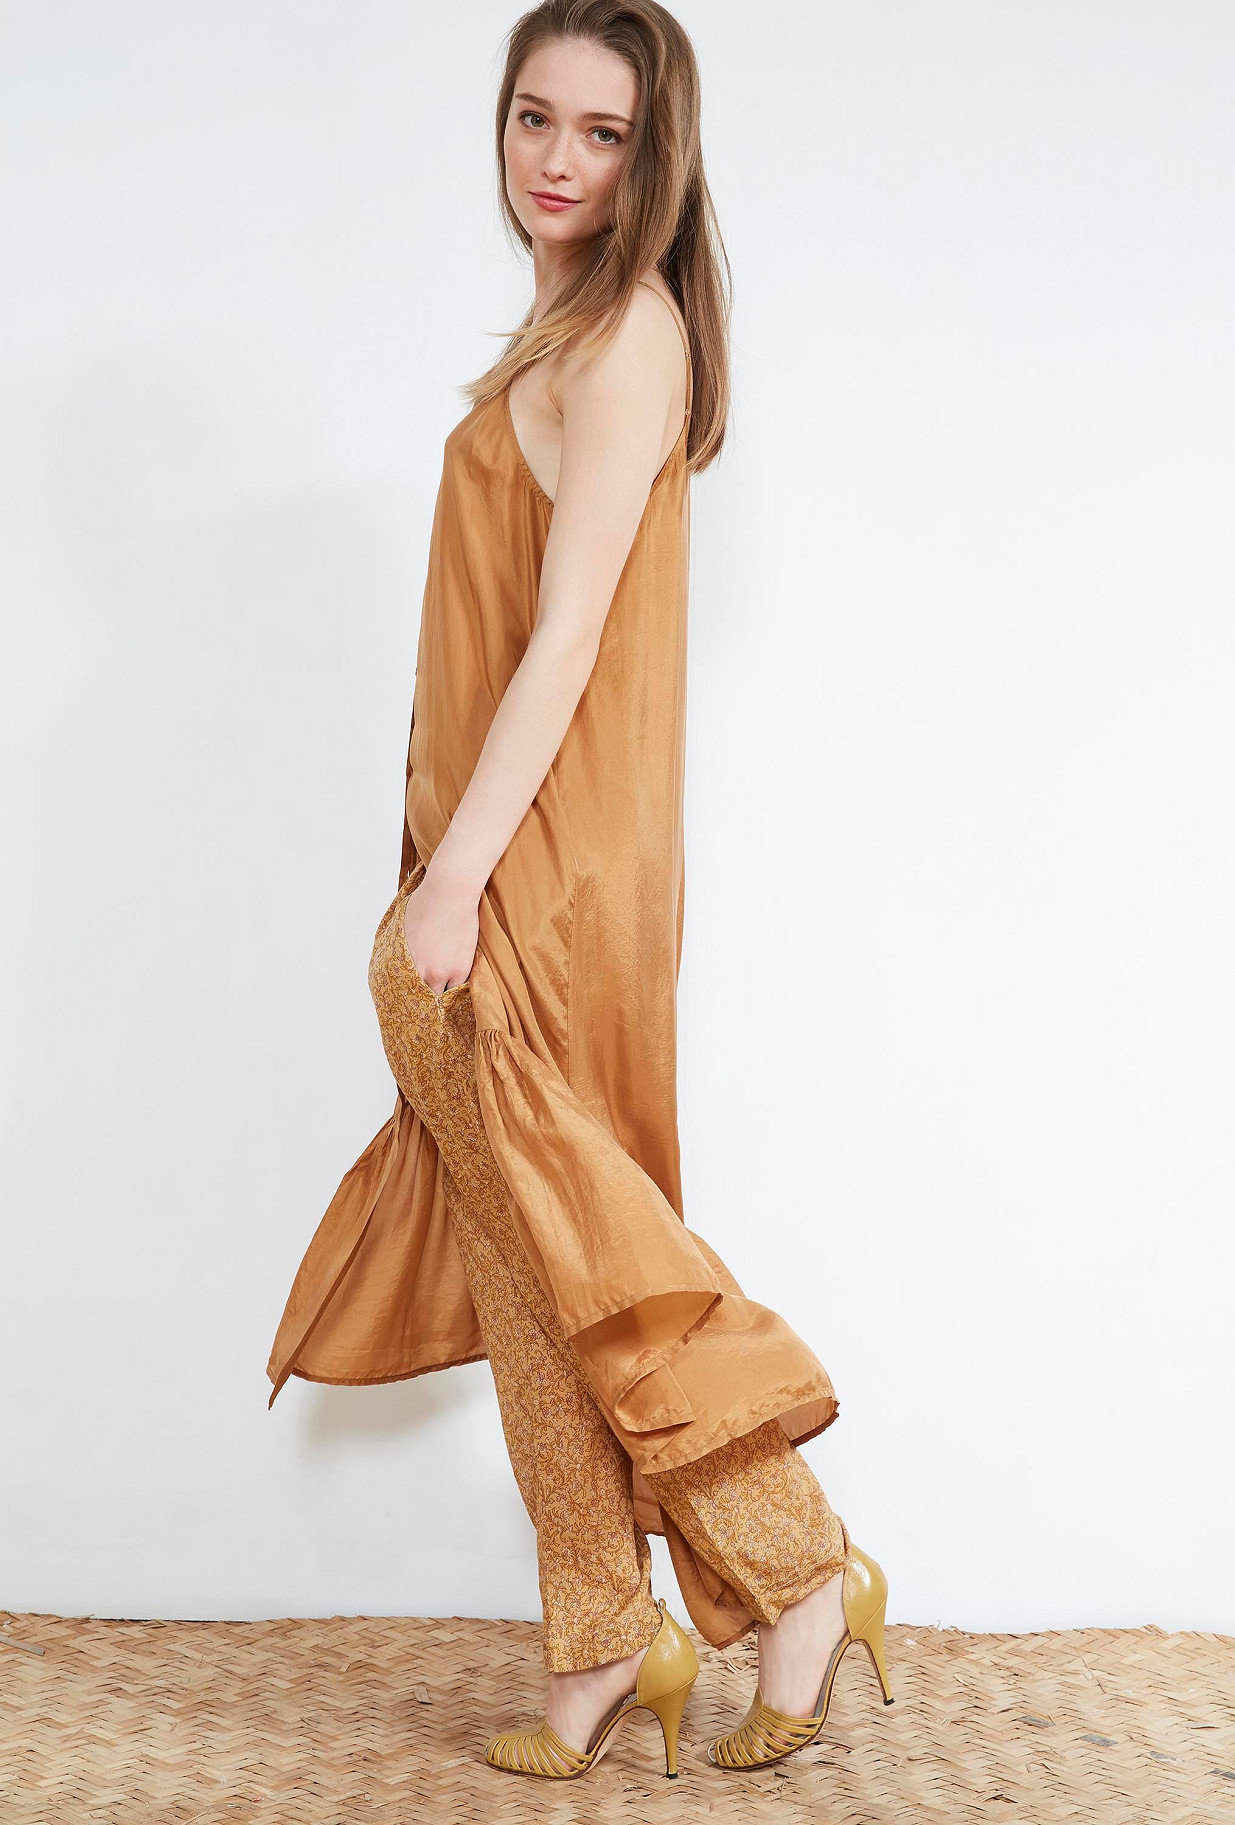 clothes store PANTS  Aladin french designer fashion Paris